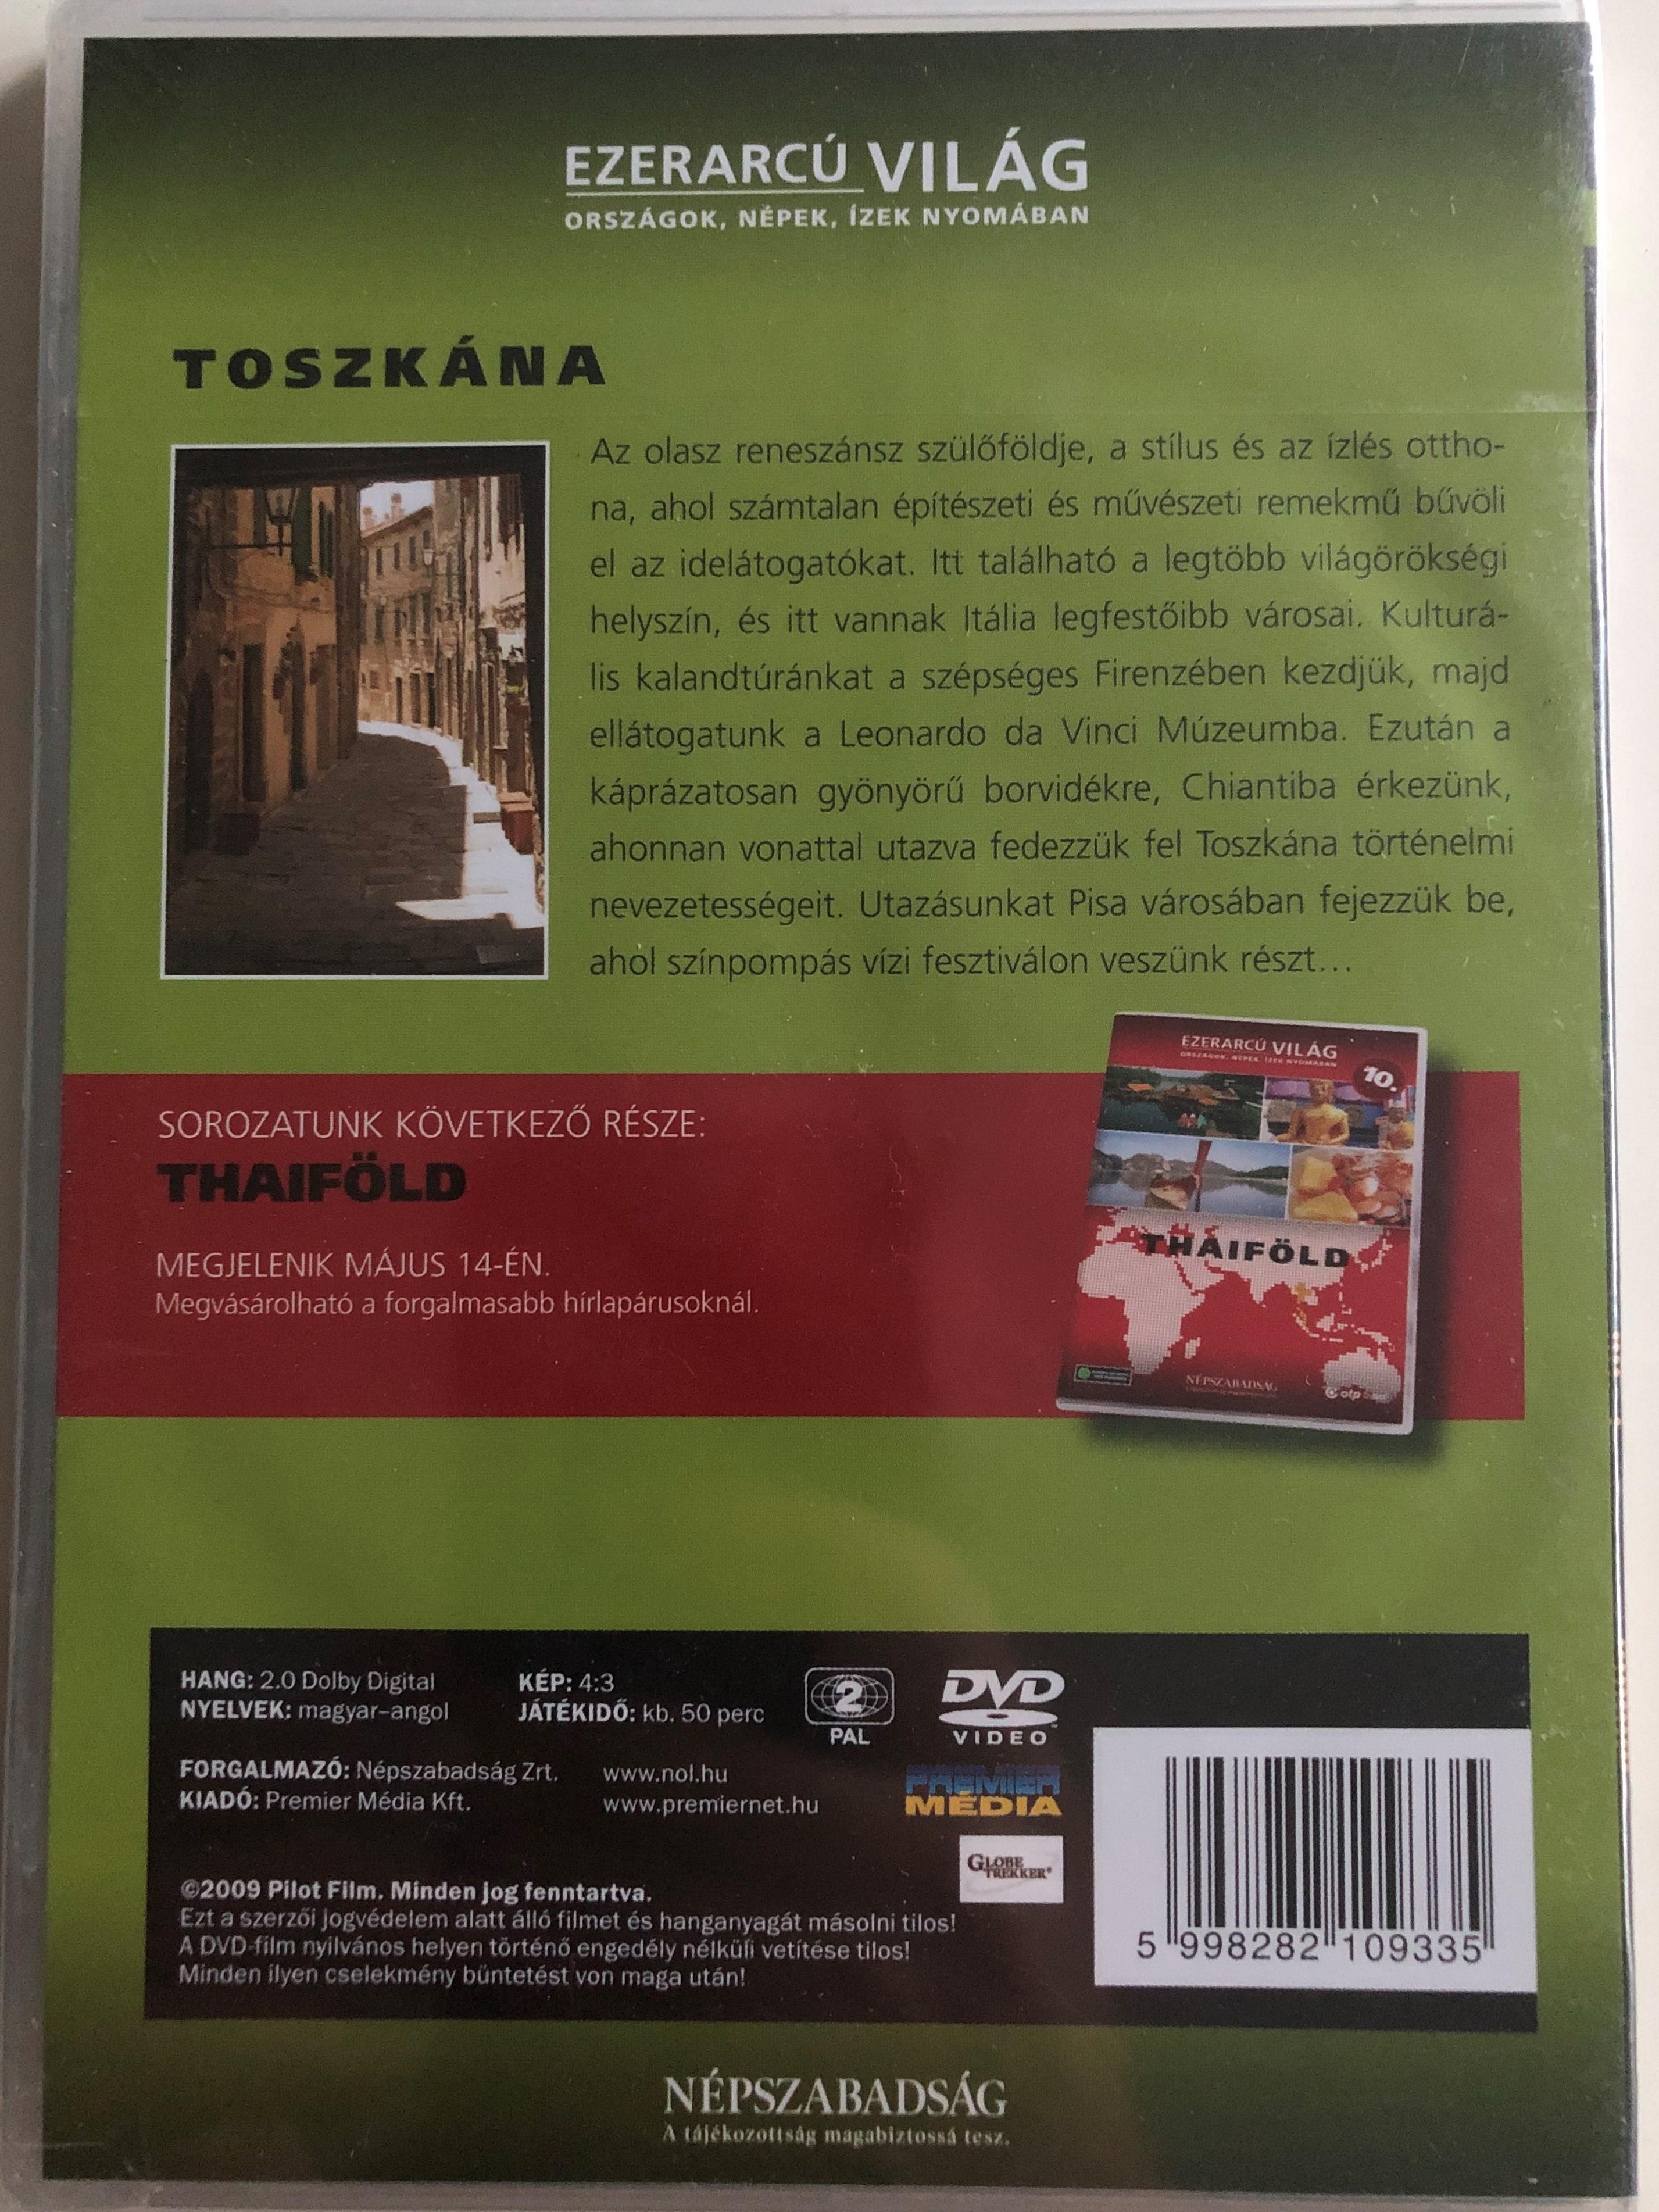 ezerarc-vil-g-vol.-9-toscana-dvd-2009-orsz-gok-n-pek-zek-nyom-ban-20-x-dvd-set-2009-n-pszabads-g-premier-media-pilot-film-documentary-series-about-our-world-2-.jpg